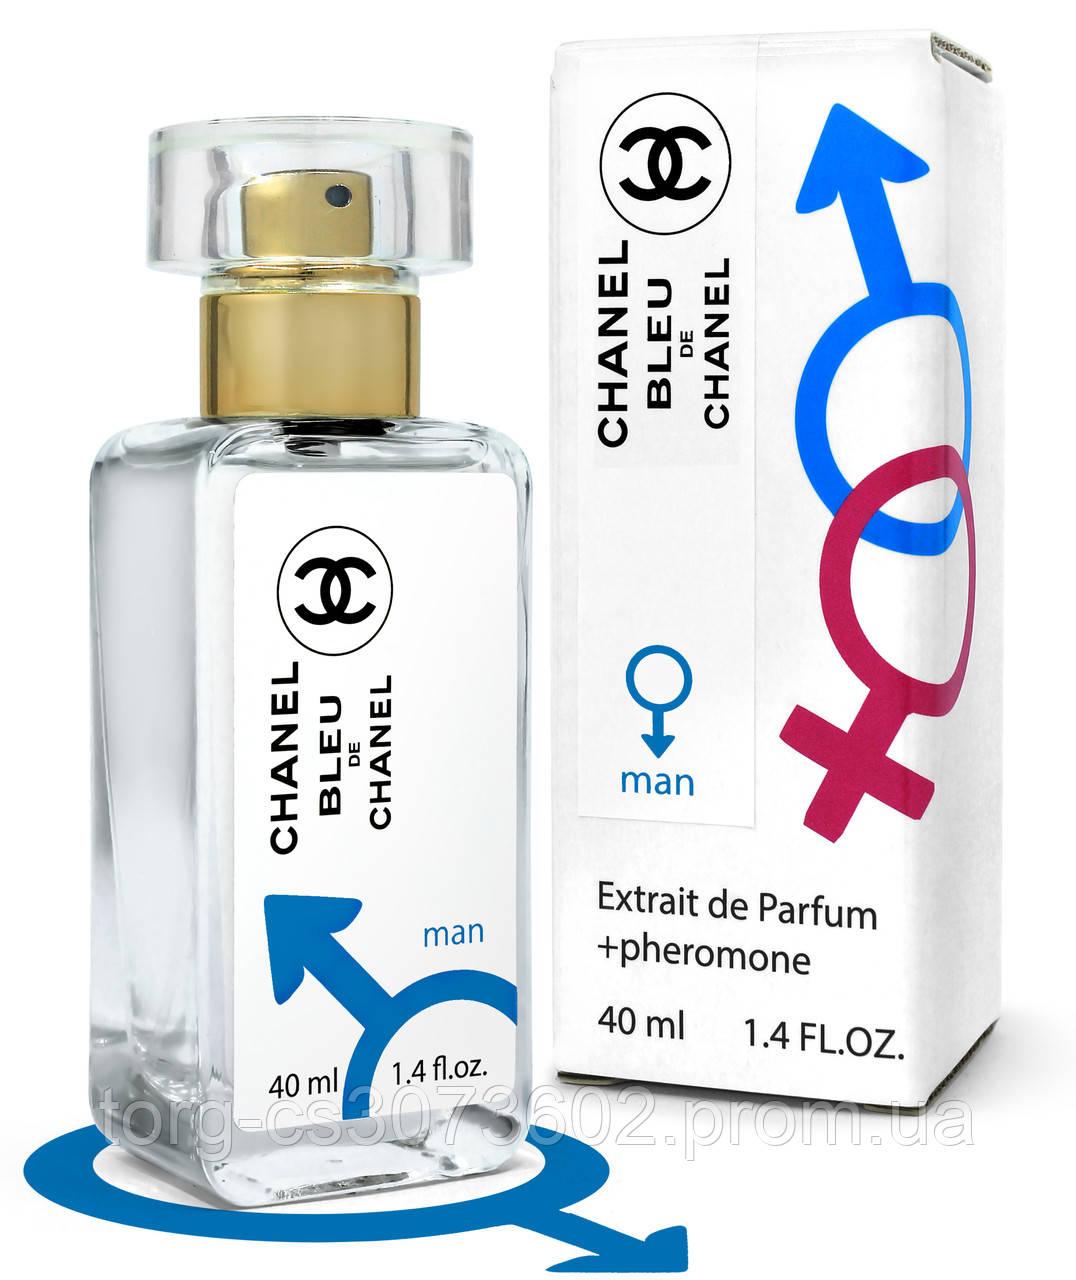 Тестер Pheromone мужской Chanel Bleu de Chanel, 40 мл.